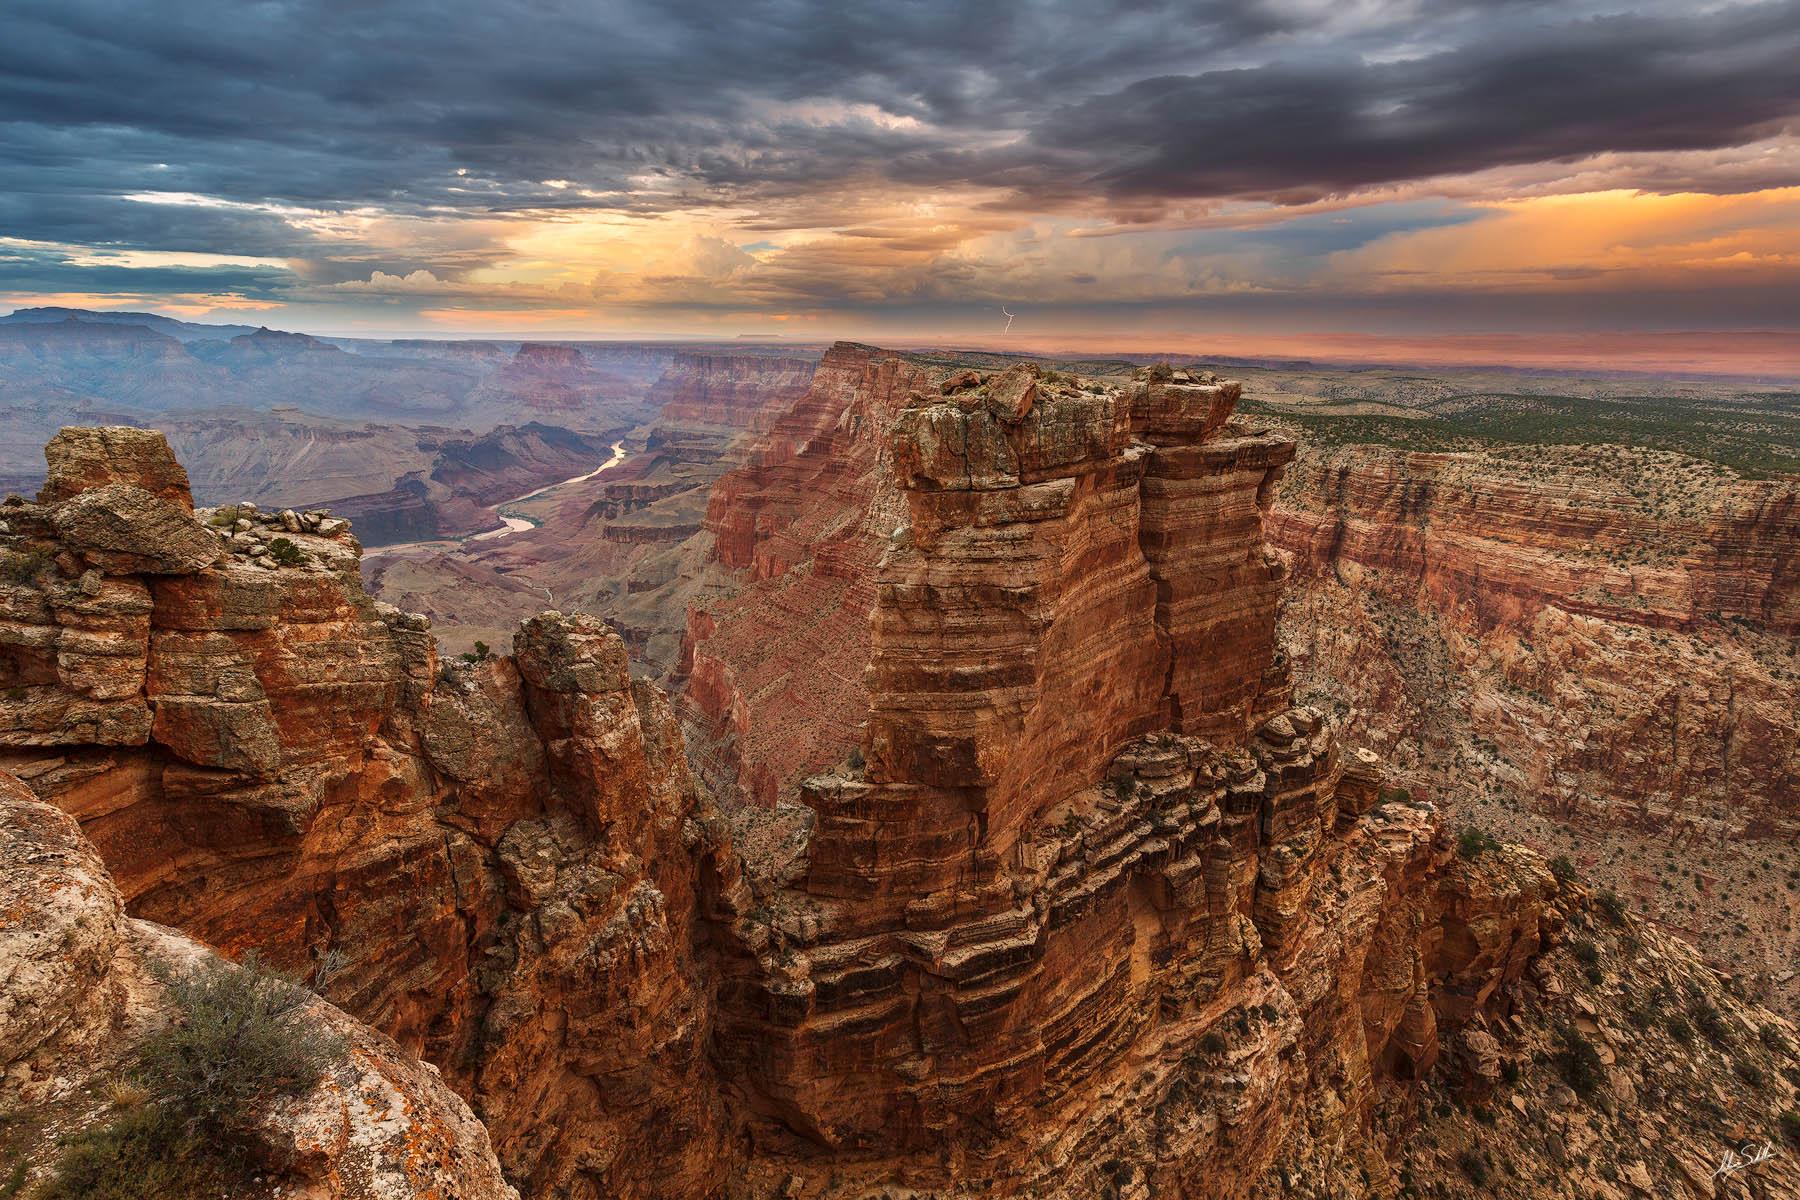 AZ, Arizona, Colorado River, Grand Canyon, Lightning, Monsoon, National Park, Painted Desert, South Rim, Storm, Summer, thunderstorm, photo